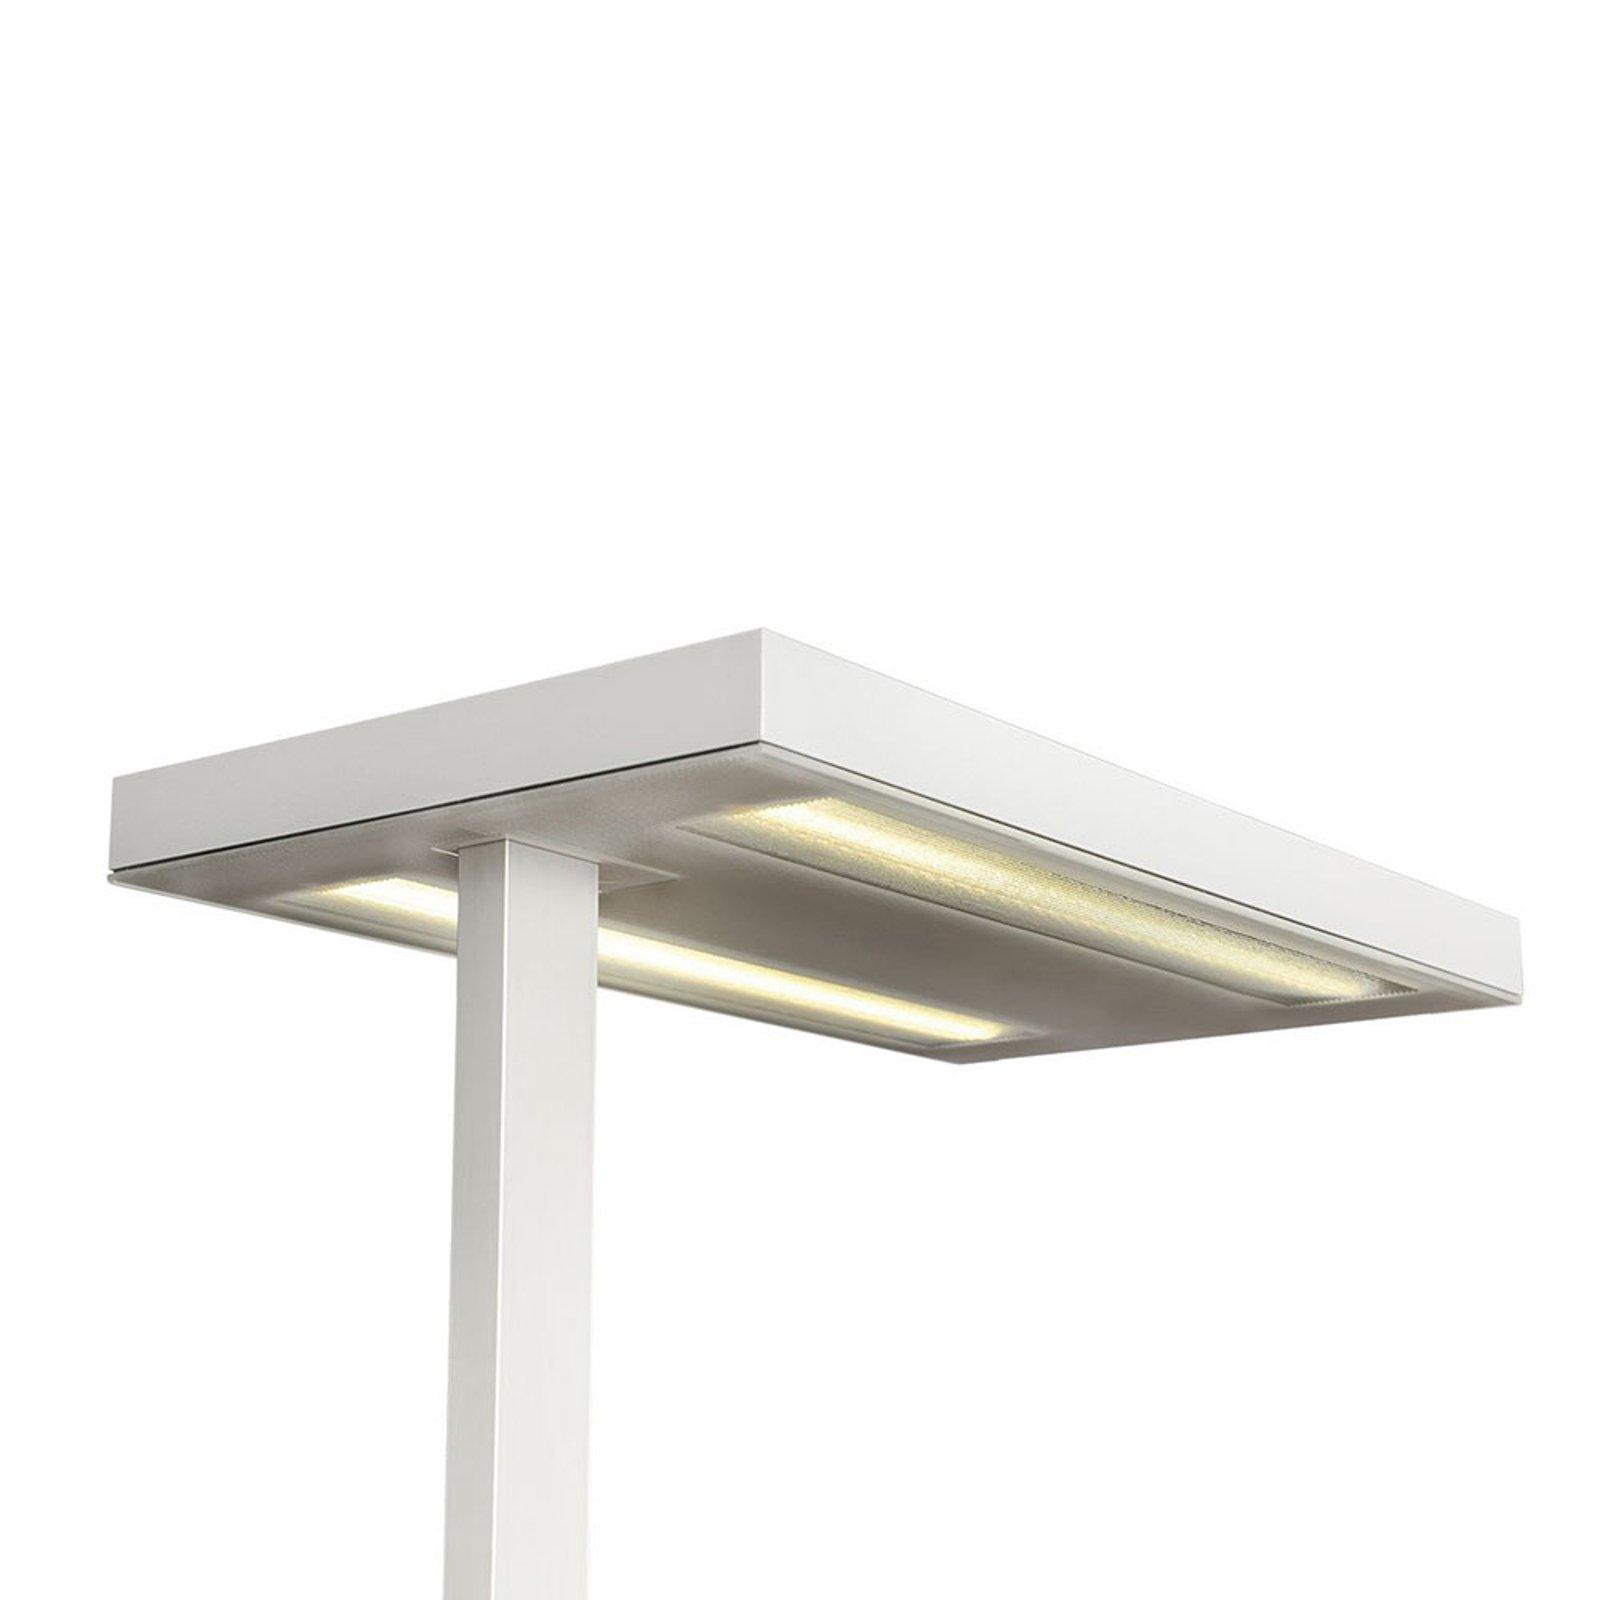 Free-F LED-gulvlampe 4 000 K dimbar sensor hvit